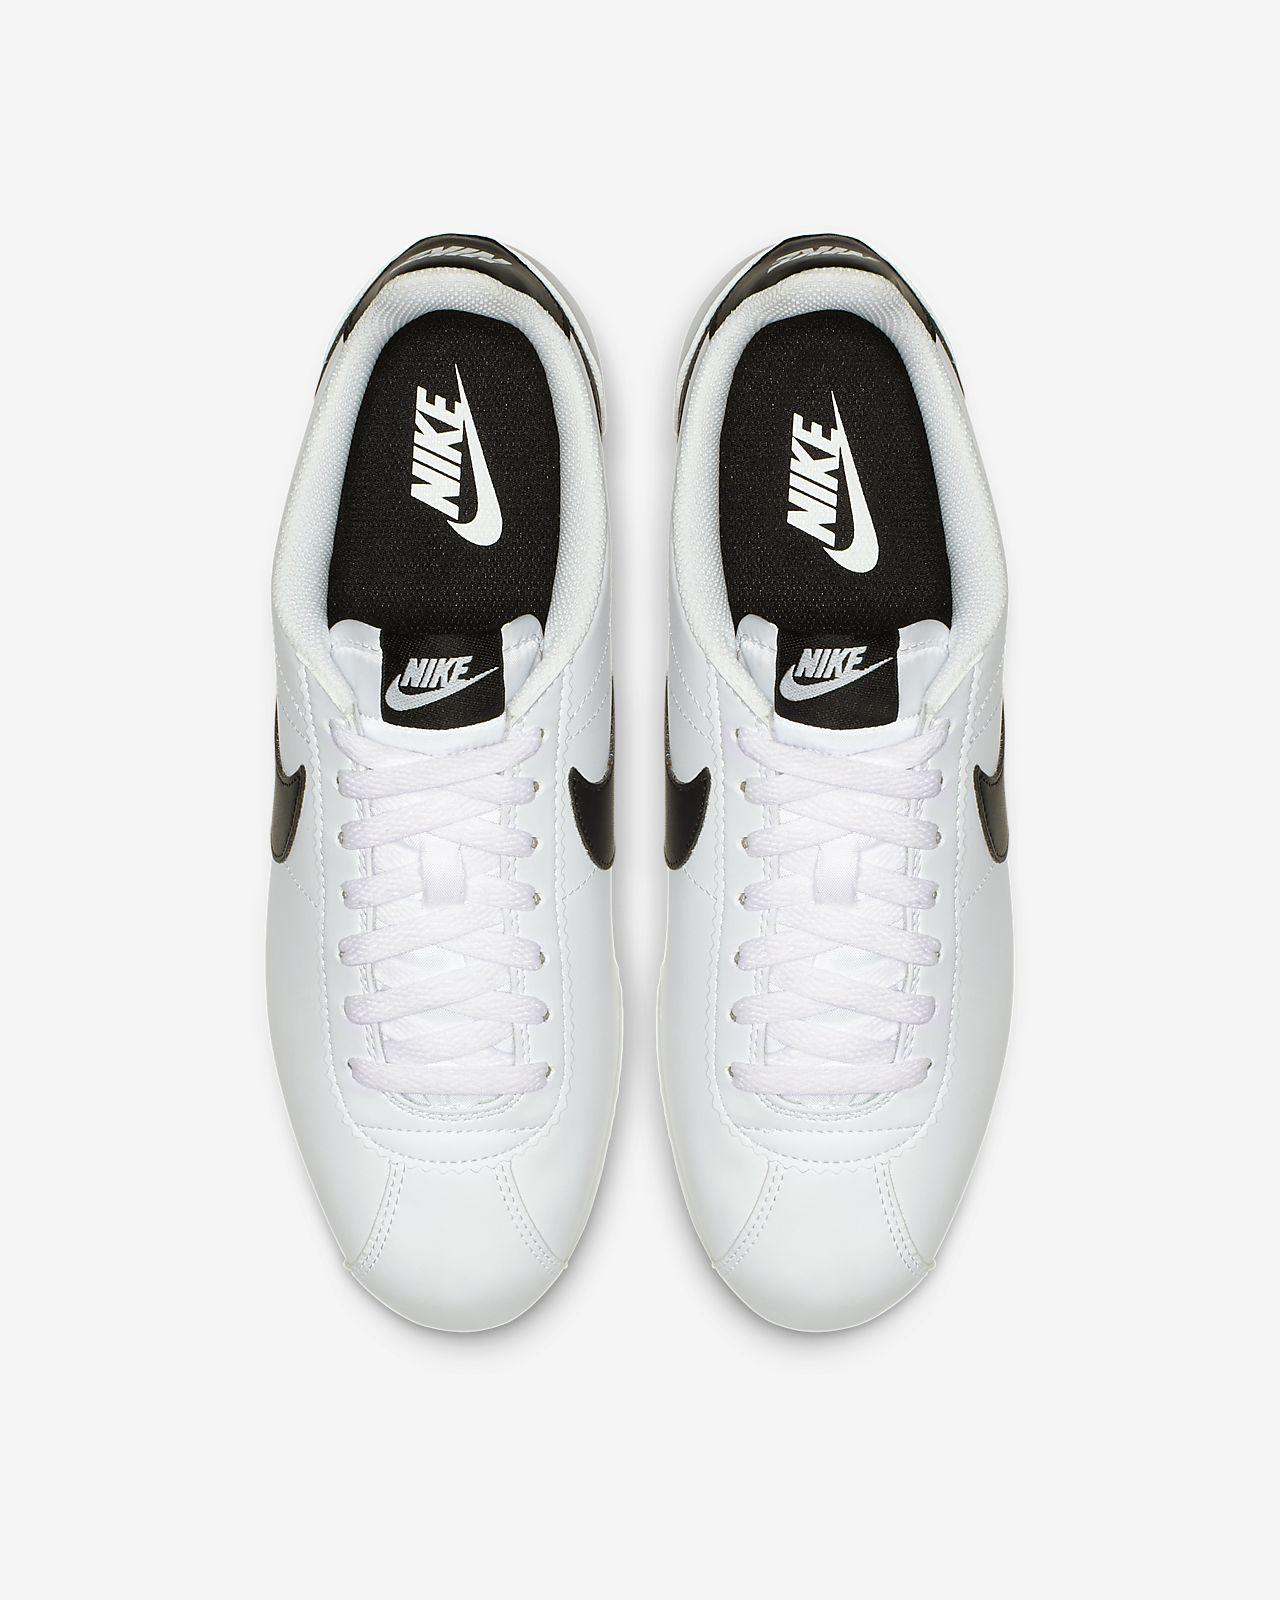 Gyár Kimenet NŐI CIPŐ Nike Womens Nike Classic Cortez